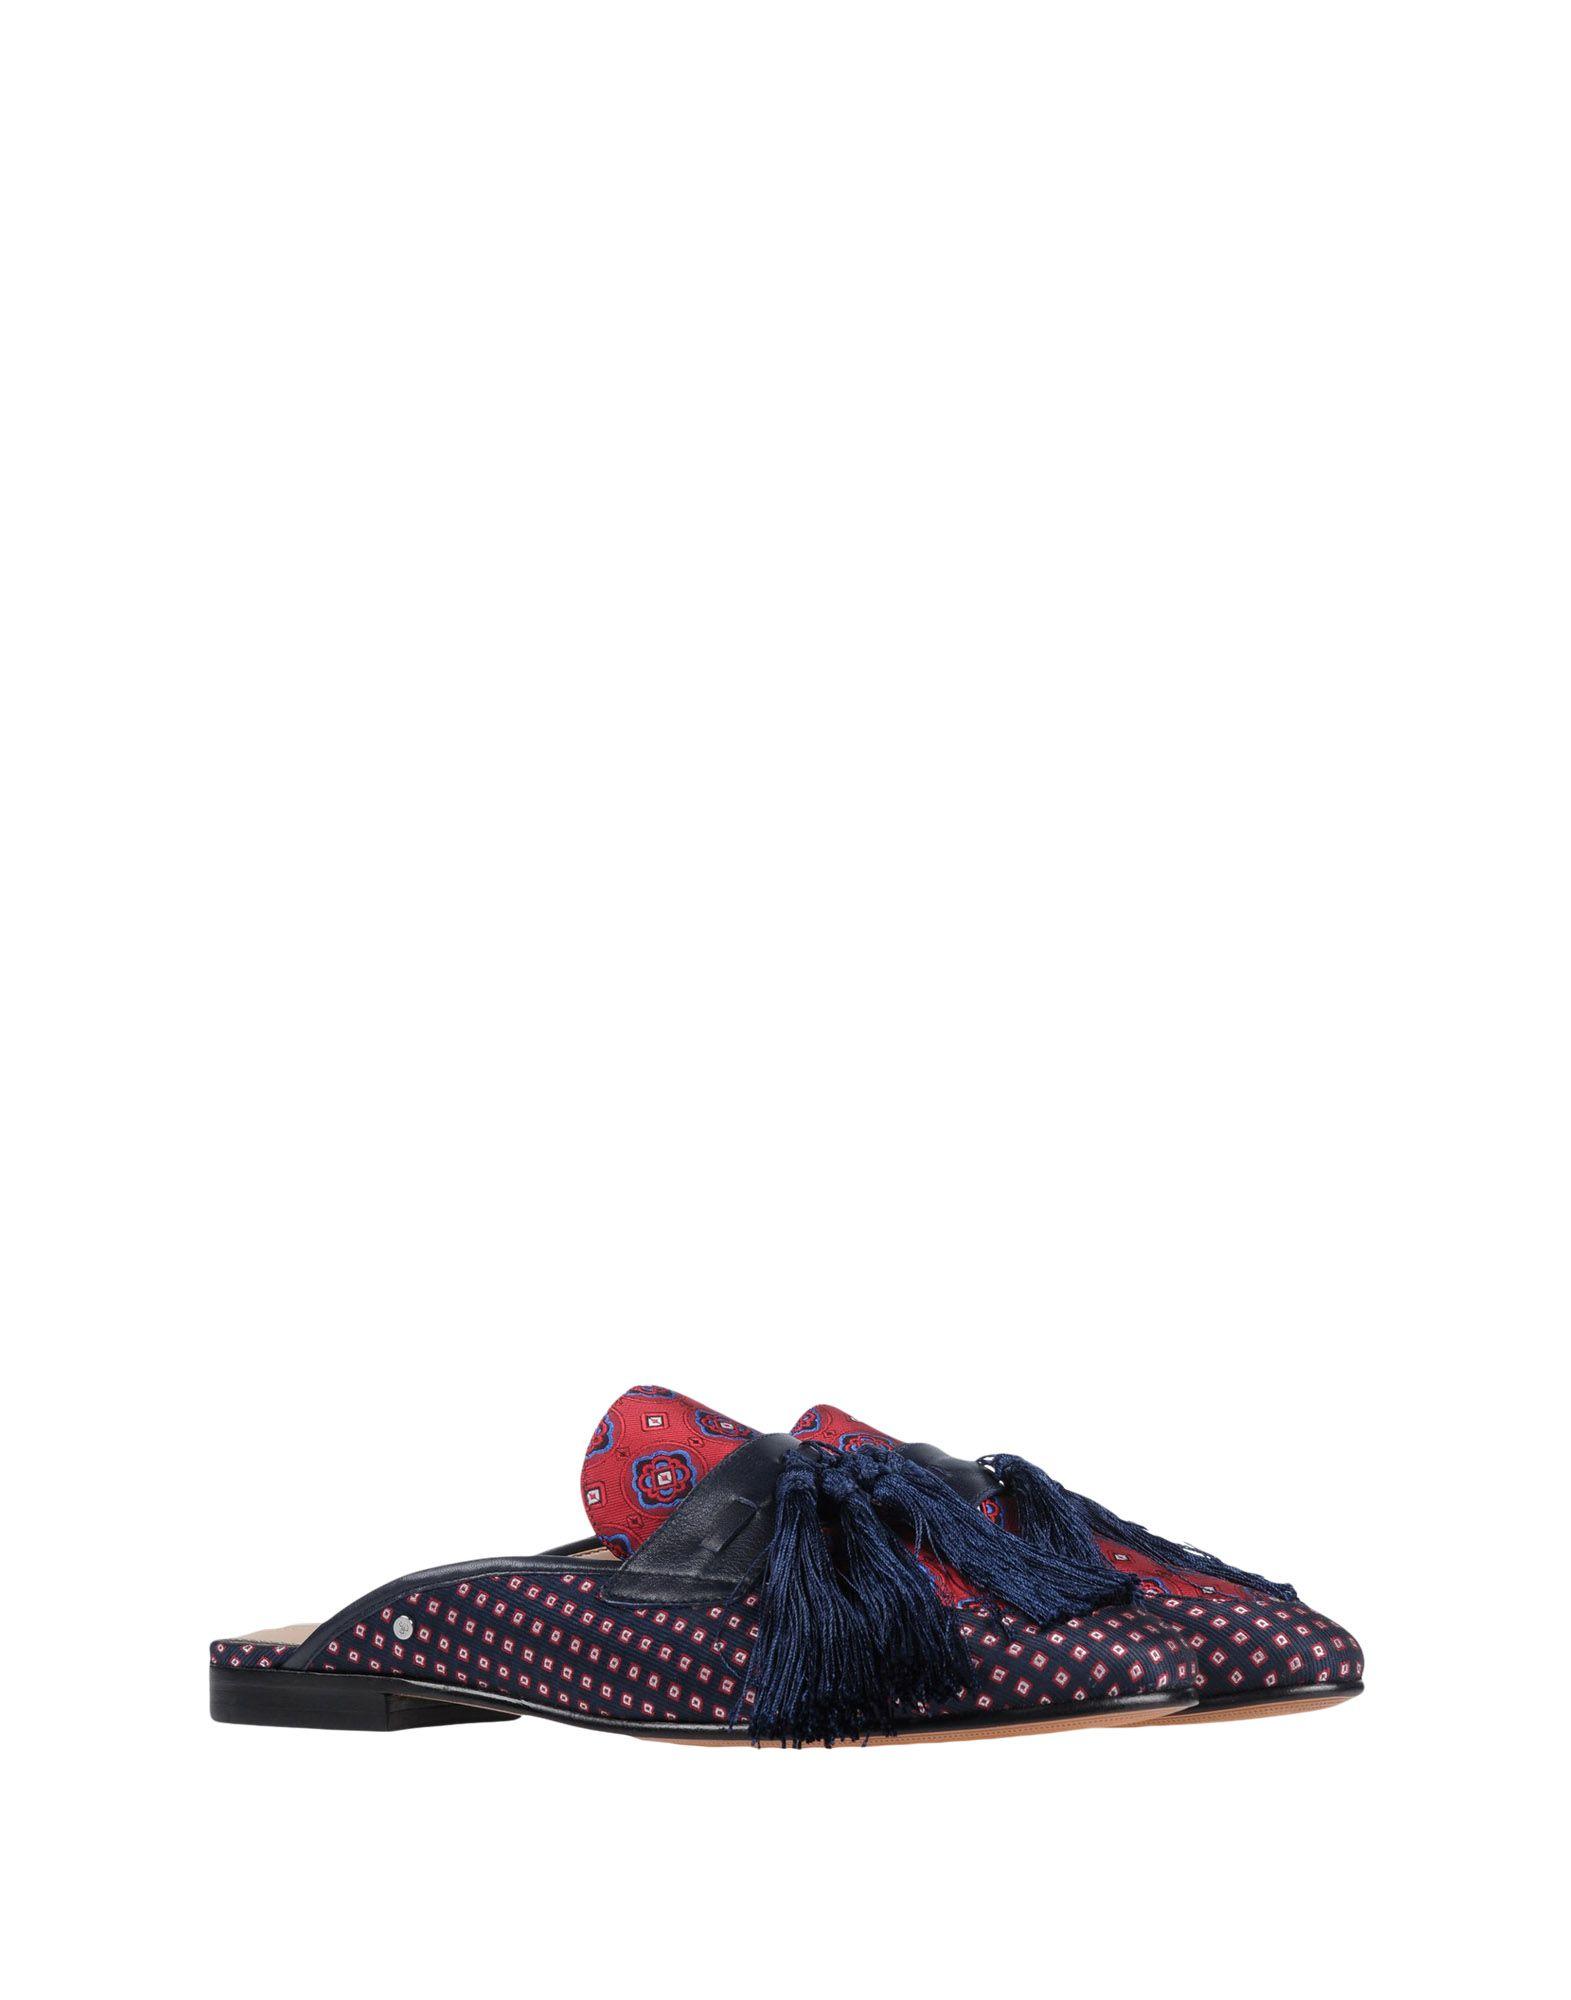 Sam Edelman Gute Pantoletten Damen  11449209LO Gute Edelman Qualität beliebte Schuhe 54d6d9